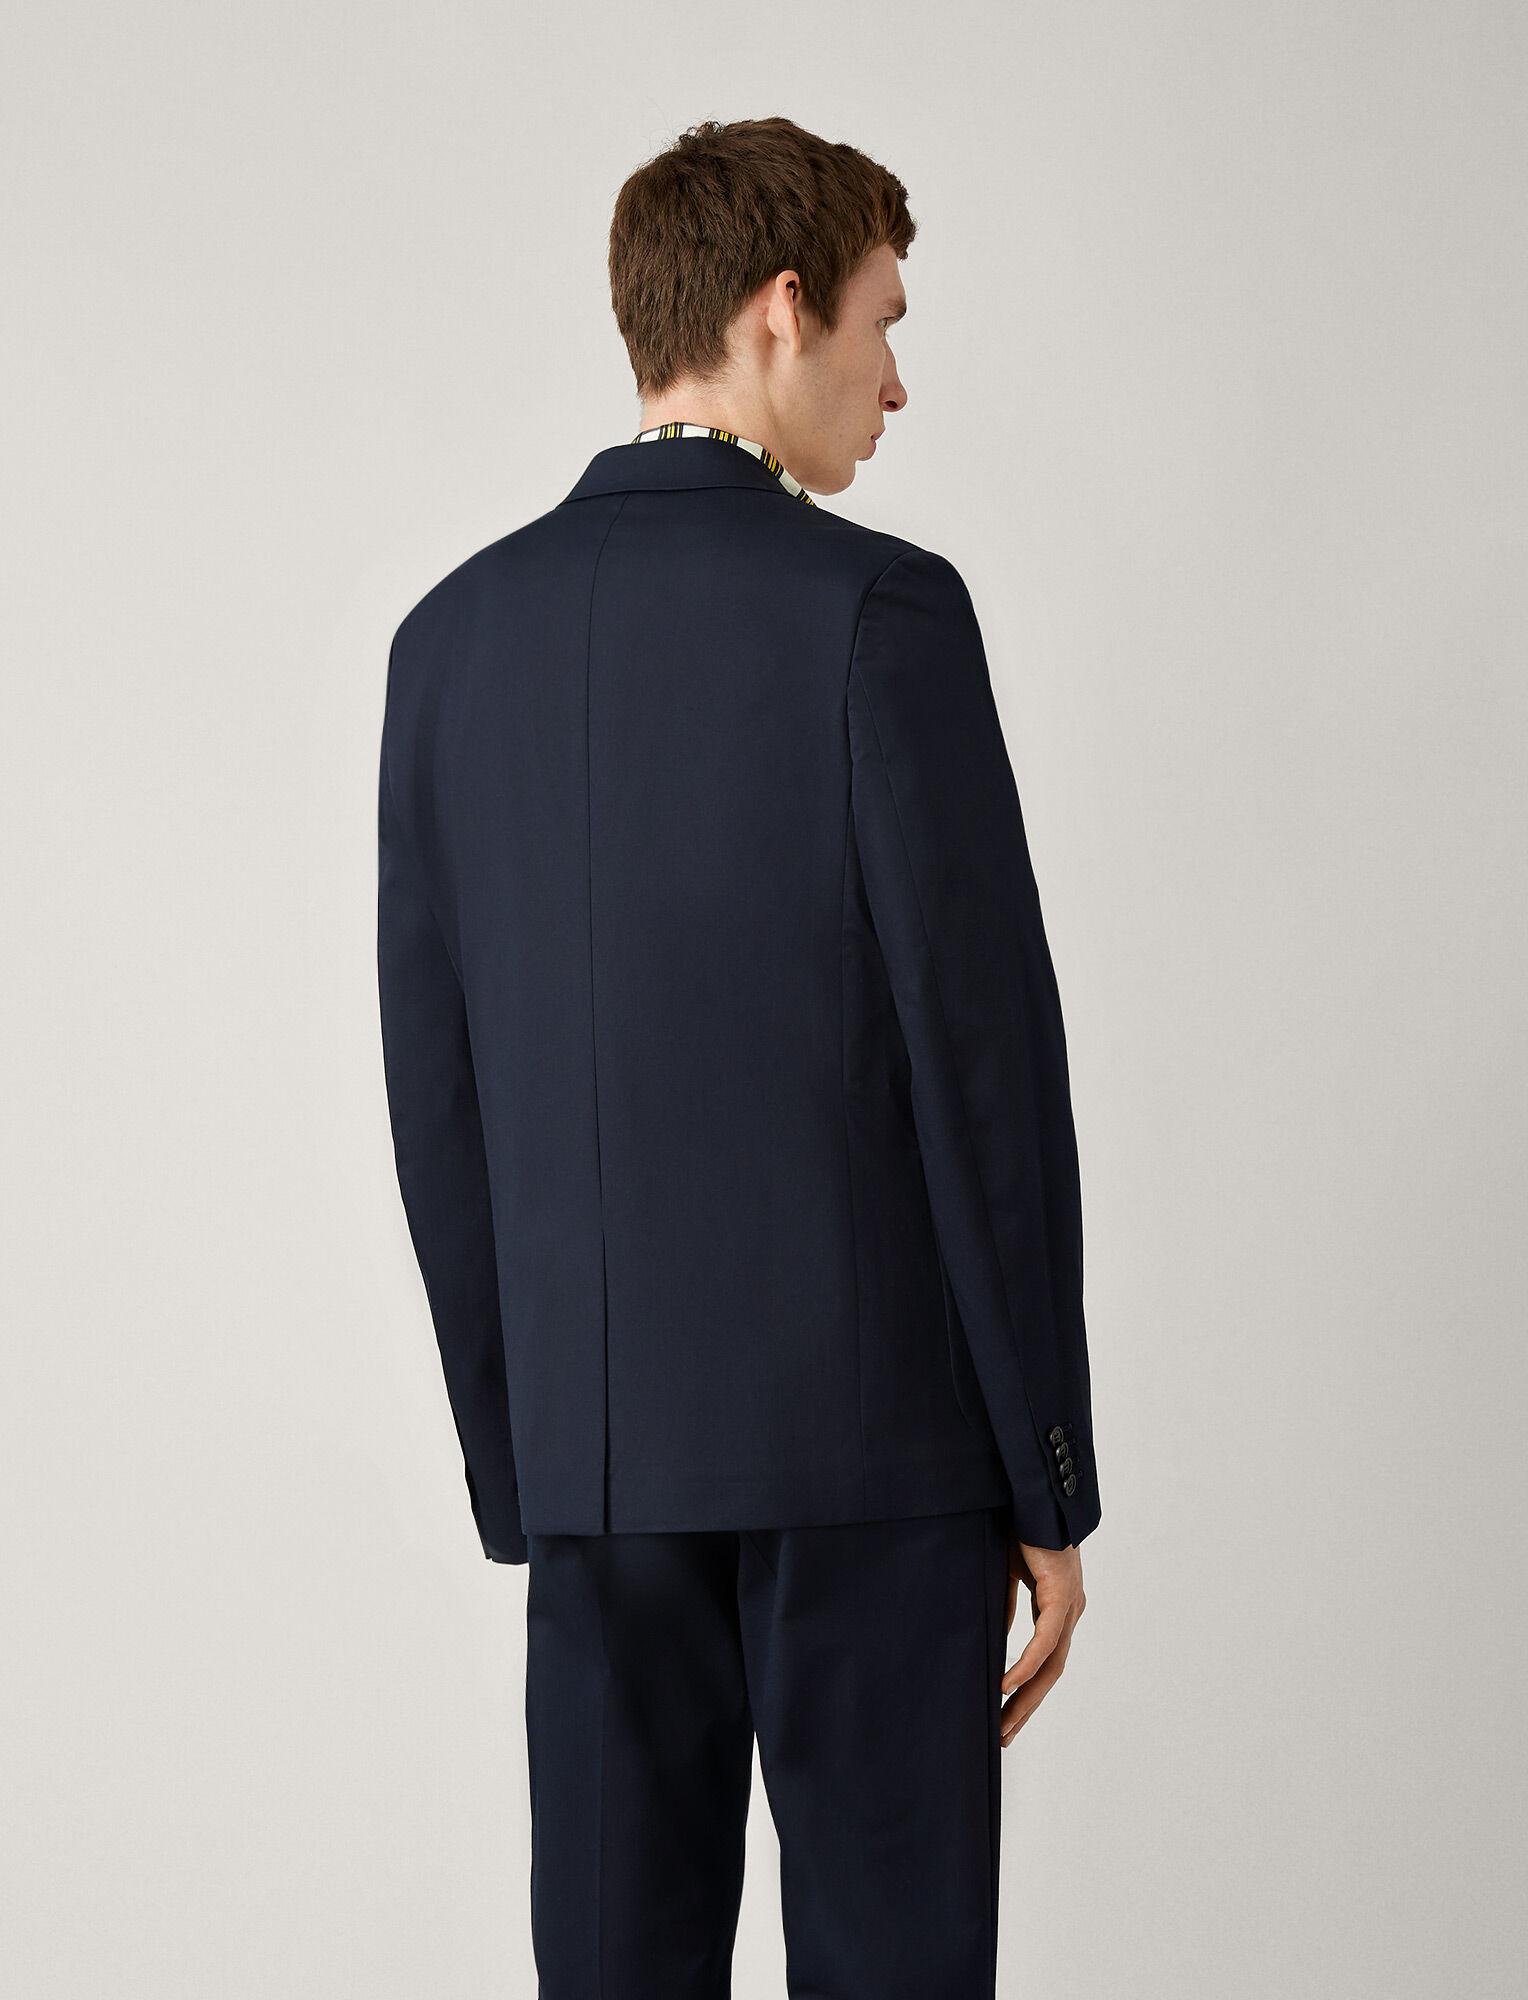 Joseph, Cassis Fine Gabardine Stretch Jacket, in NAVY